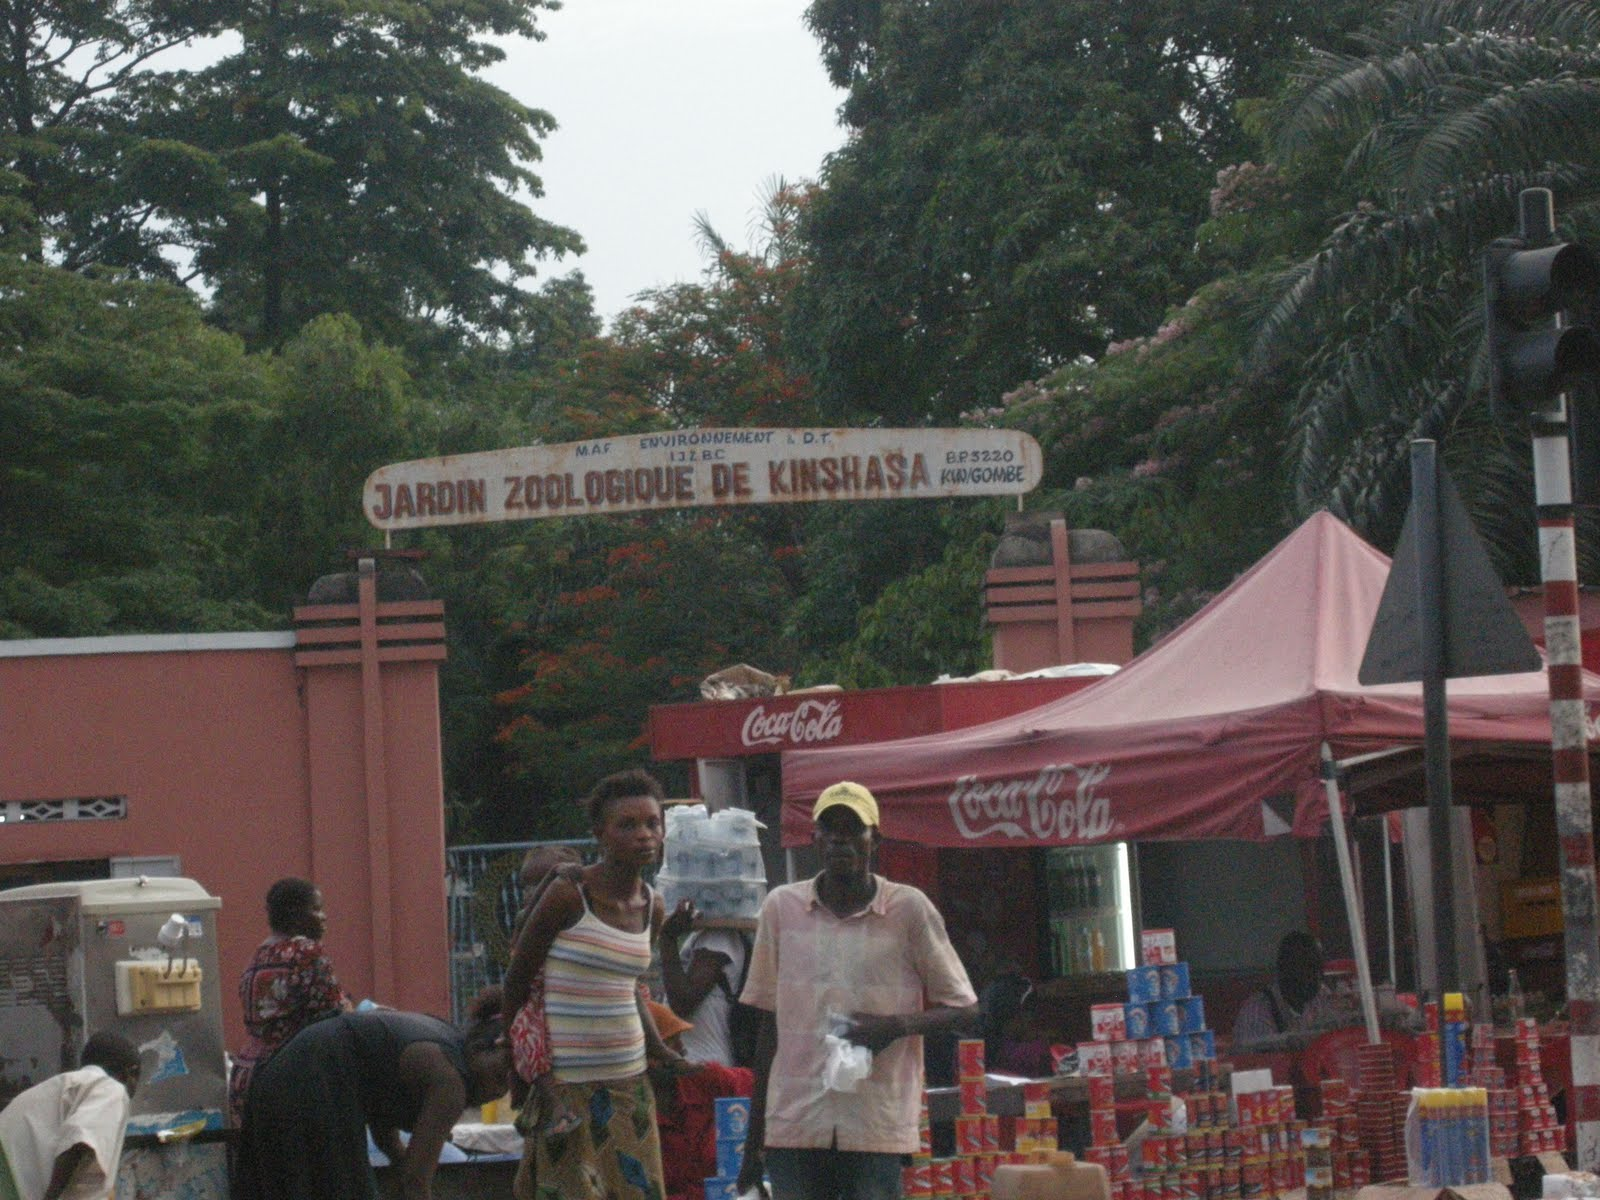 Congo masquerade kinshasa voter frustration for Jardin zoologique kinshasa